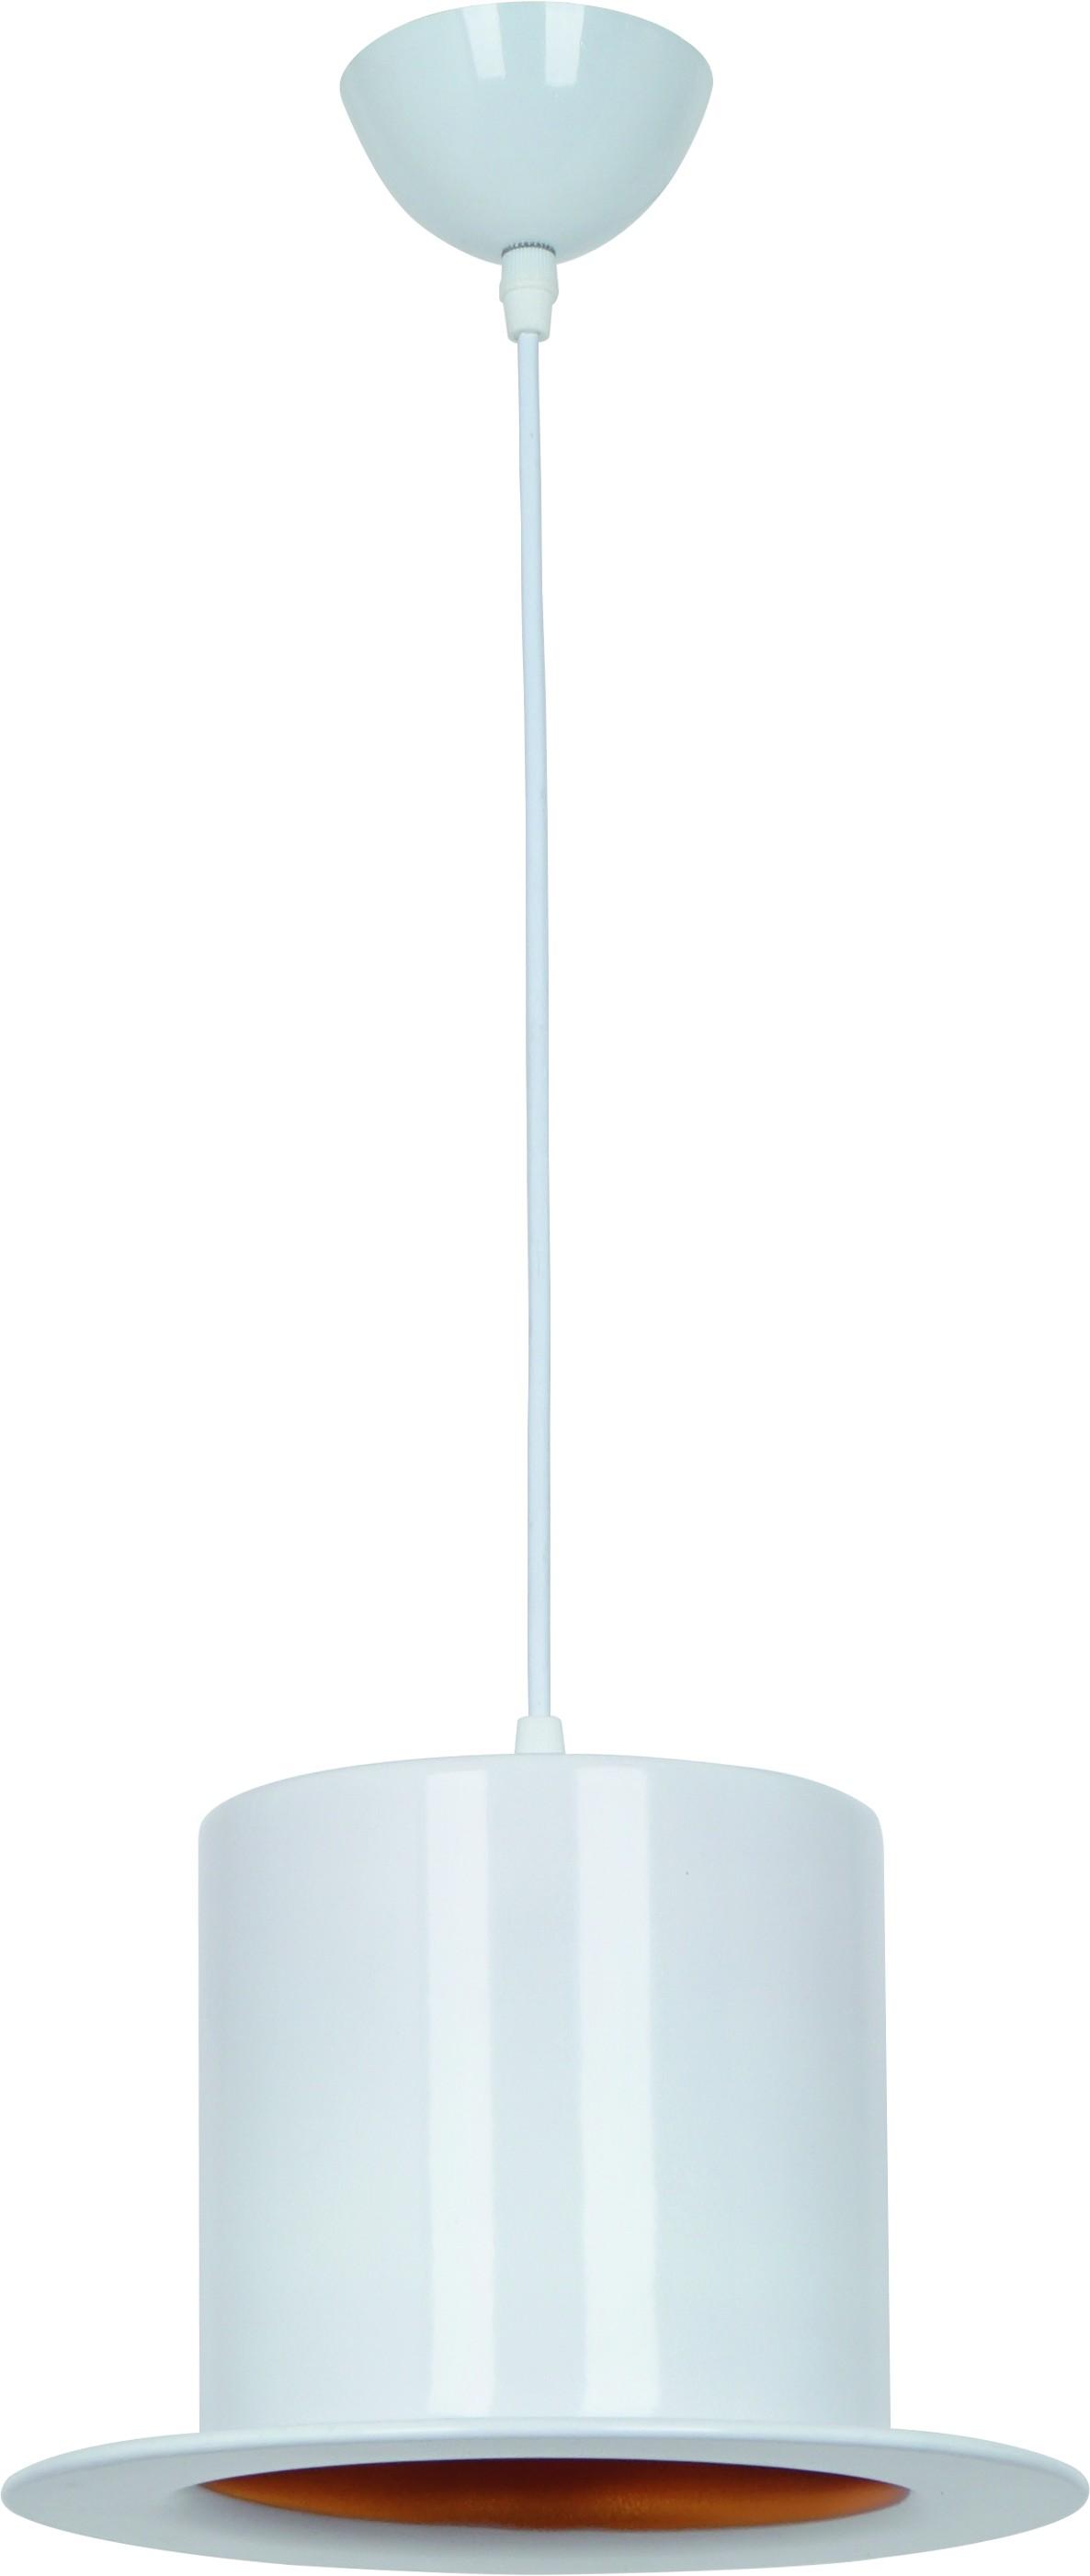 Светильник подвесной Arte lamp A3236sp-1wh arte lamp a3236sp 1wh